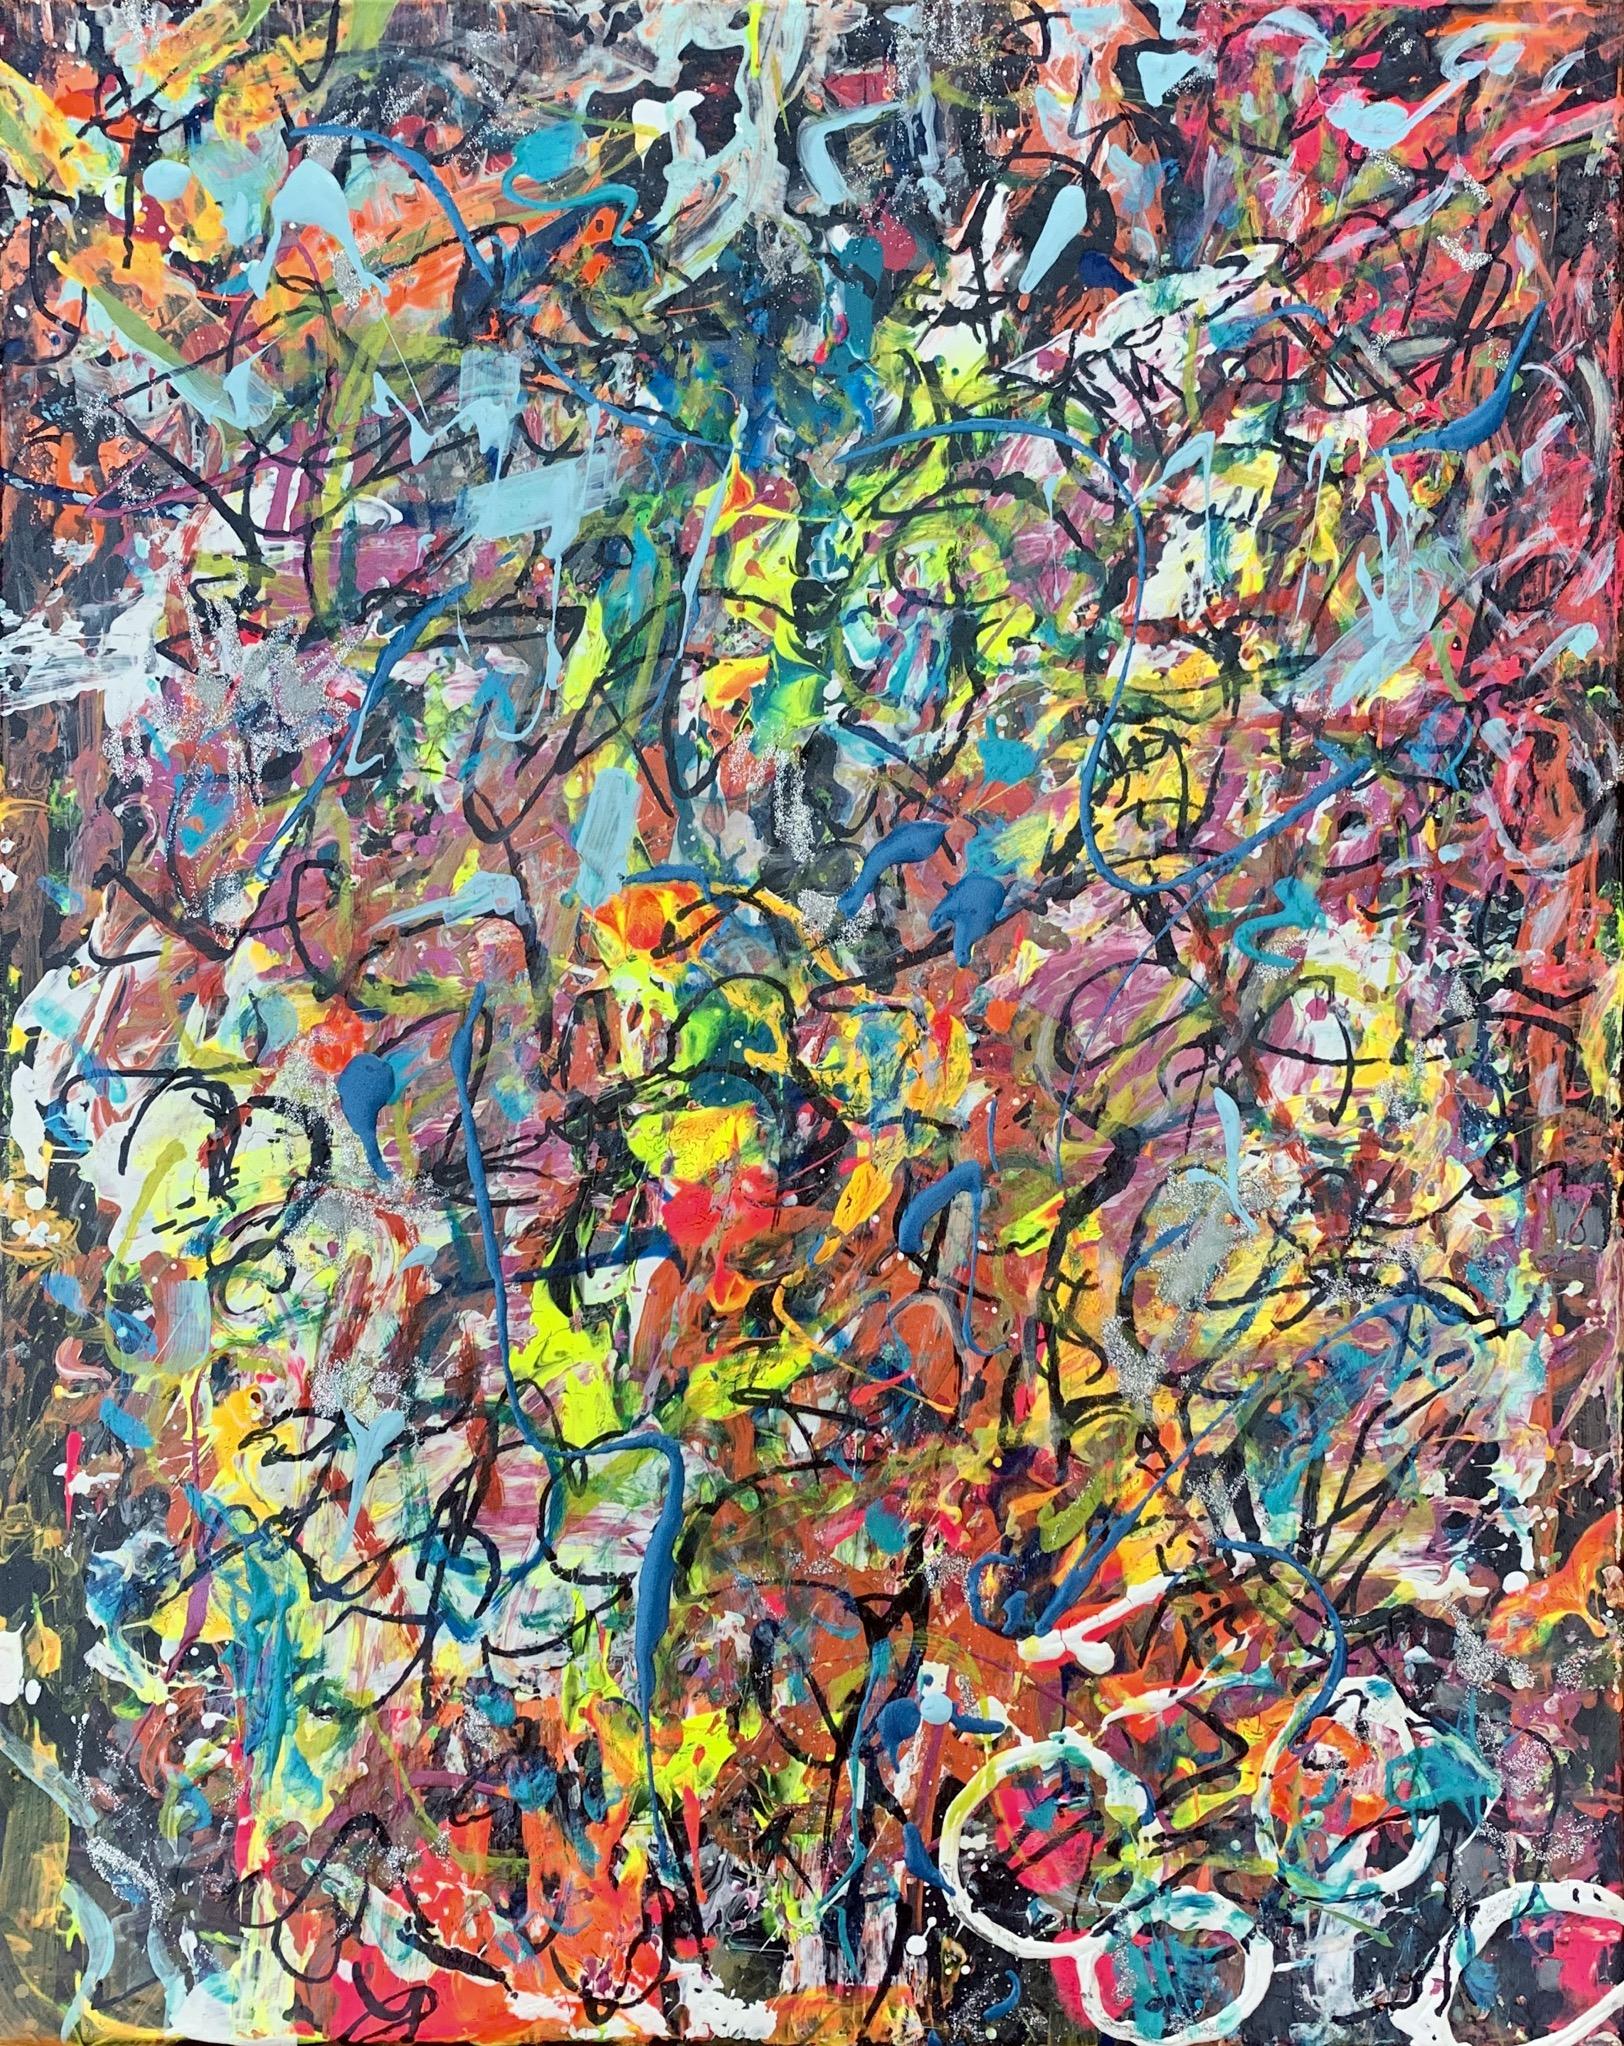 Onu by Francisco Gutiérrez | ArtworkNetwork.com